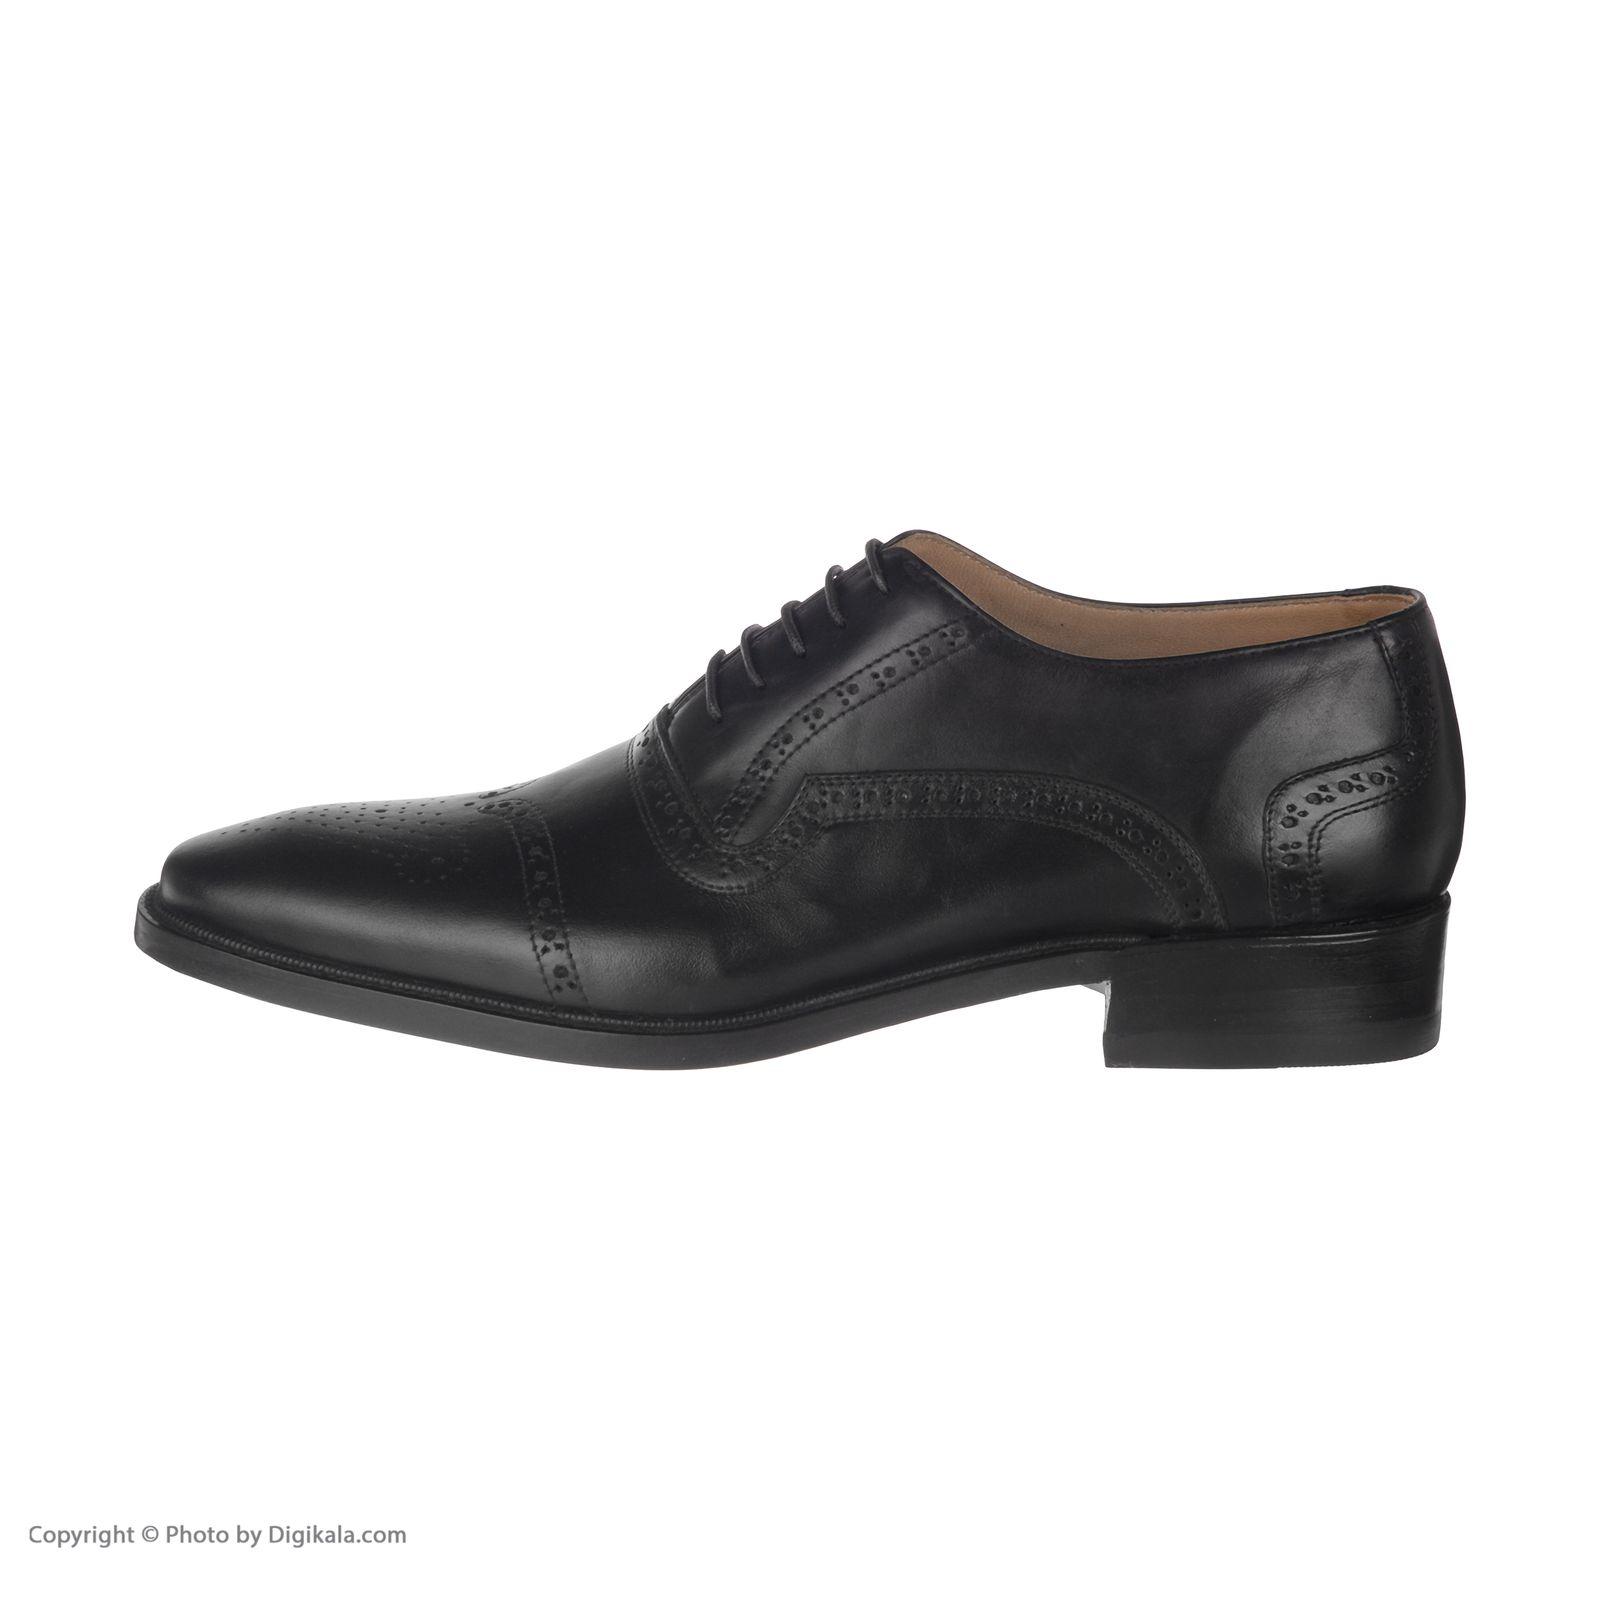 کفش مردانه نظری کد 433 -  - 1